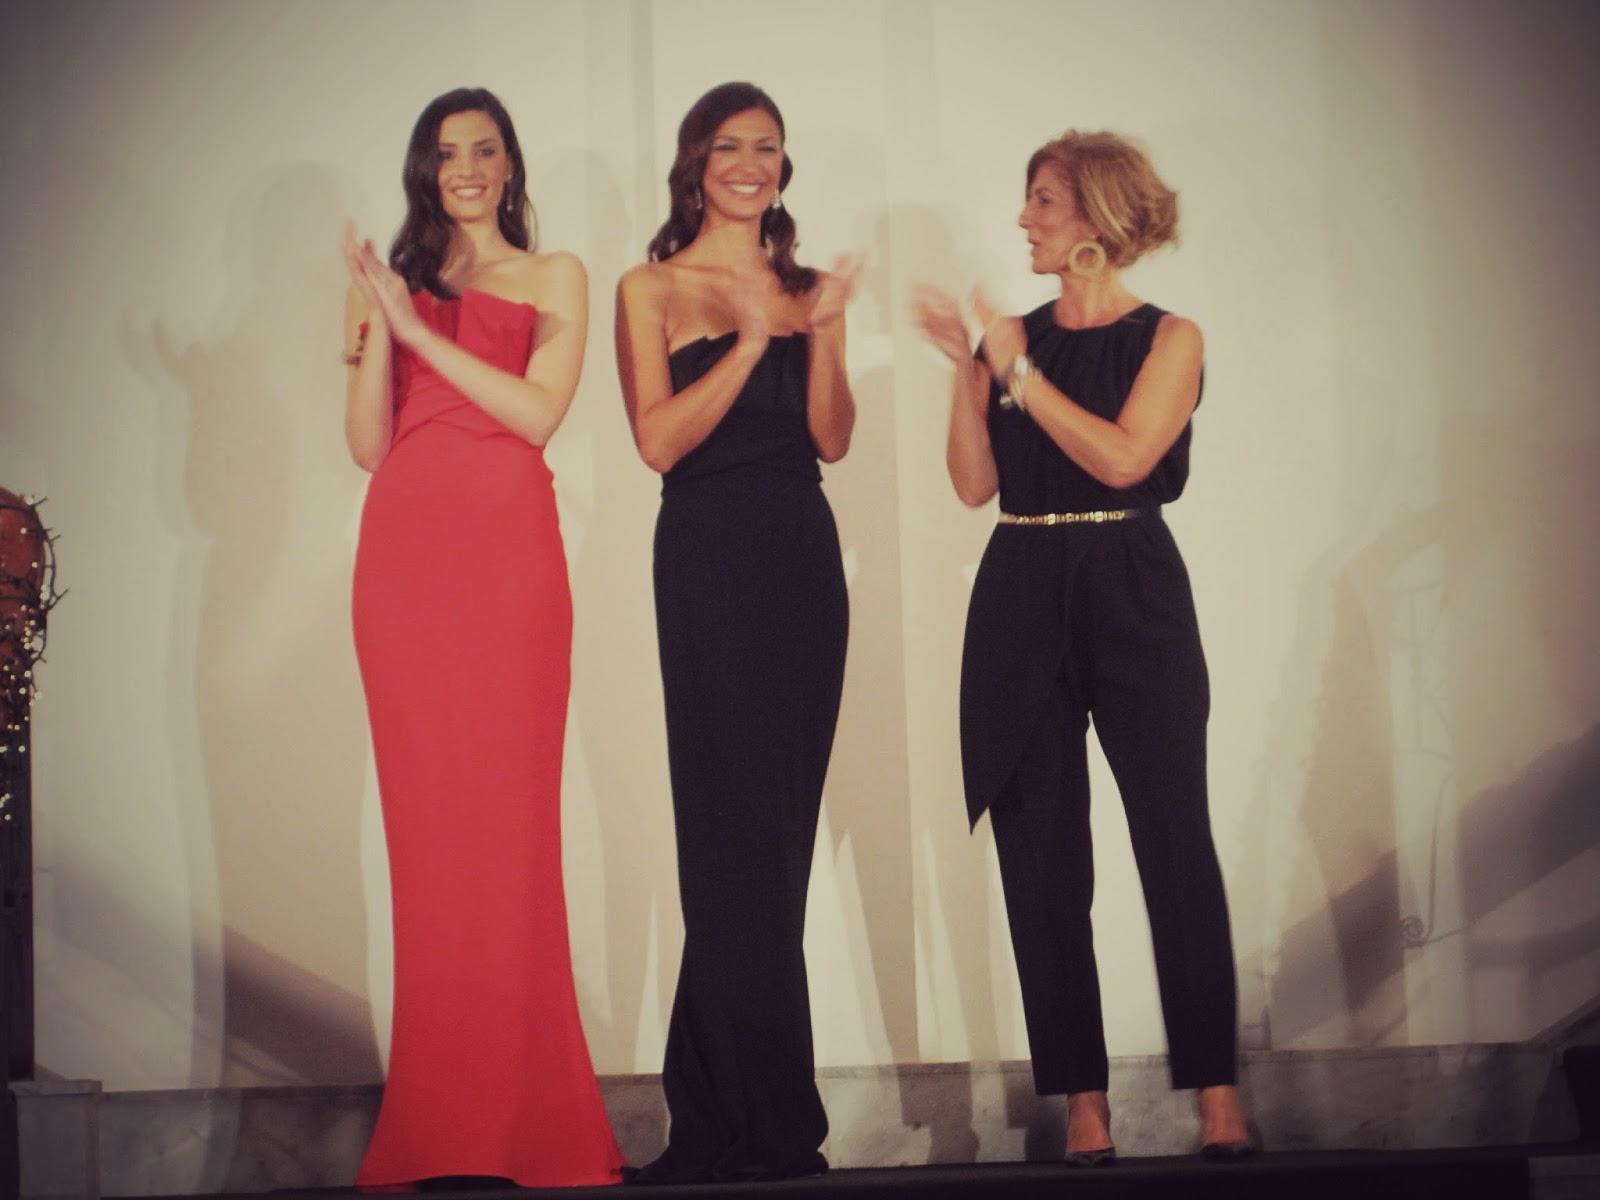 #dress, #cerimonia, la_sciarpa_viola, claudia_magro